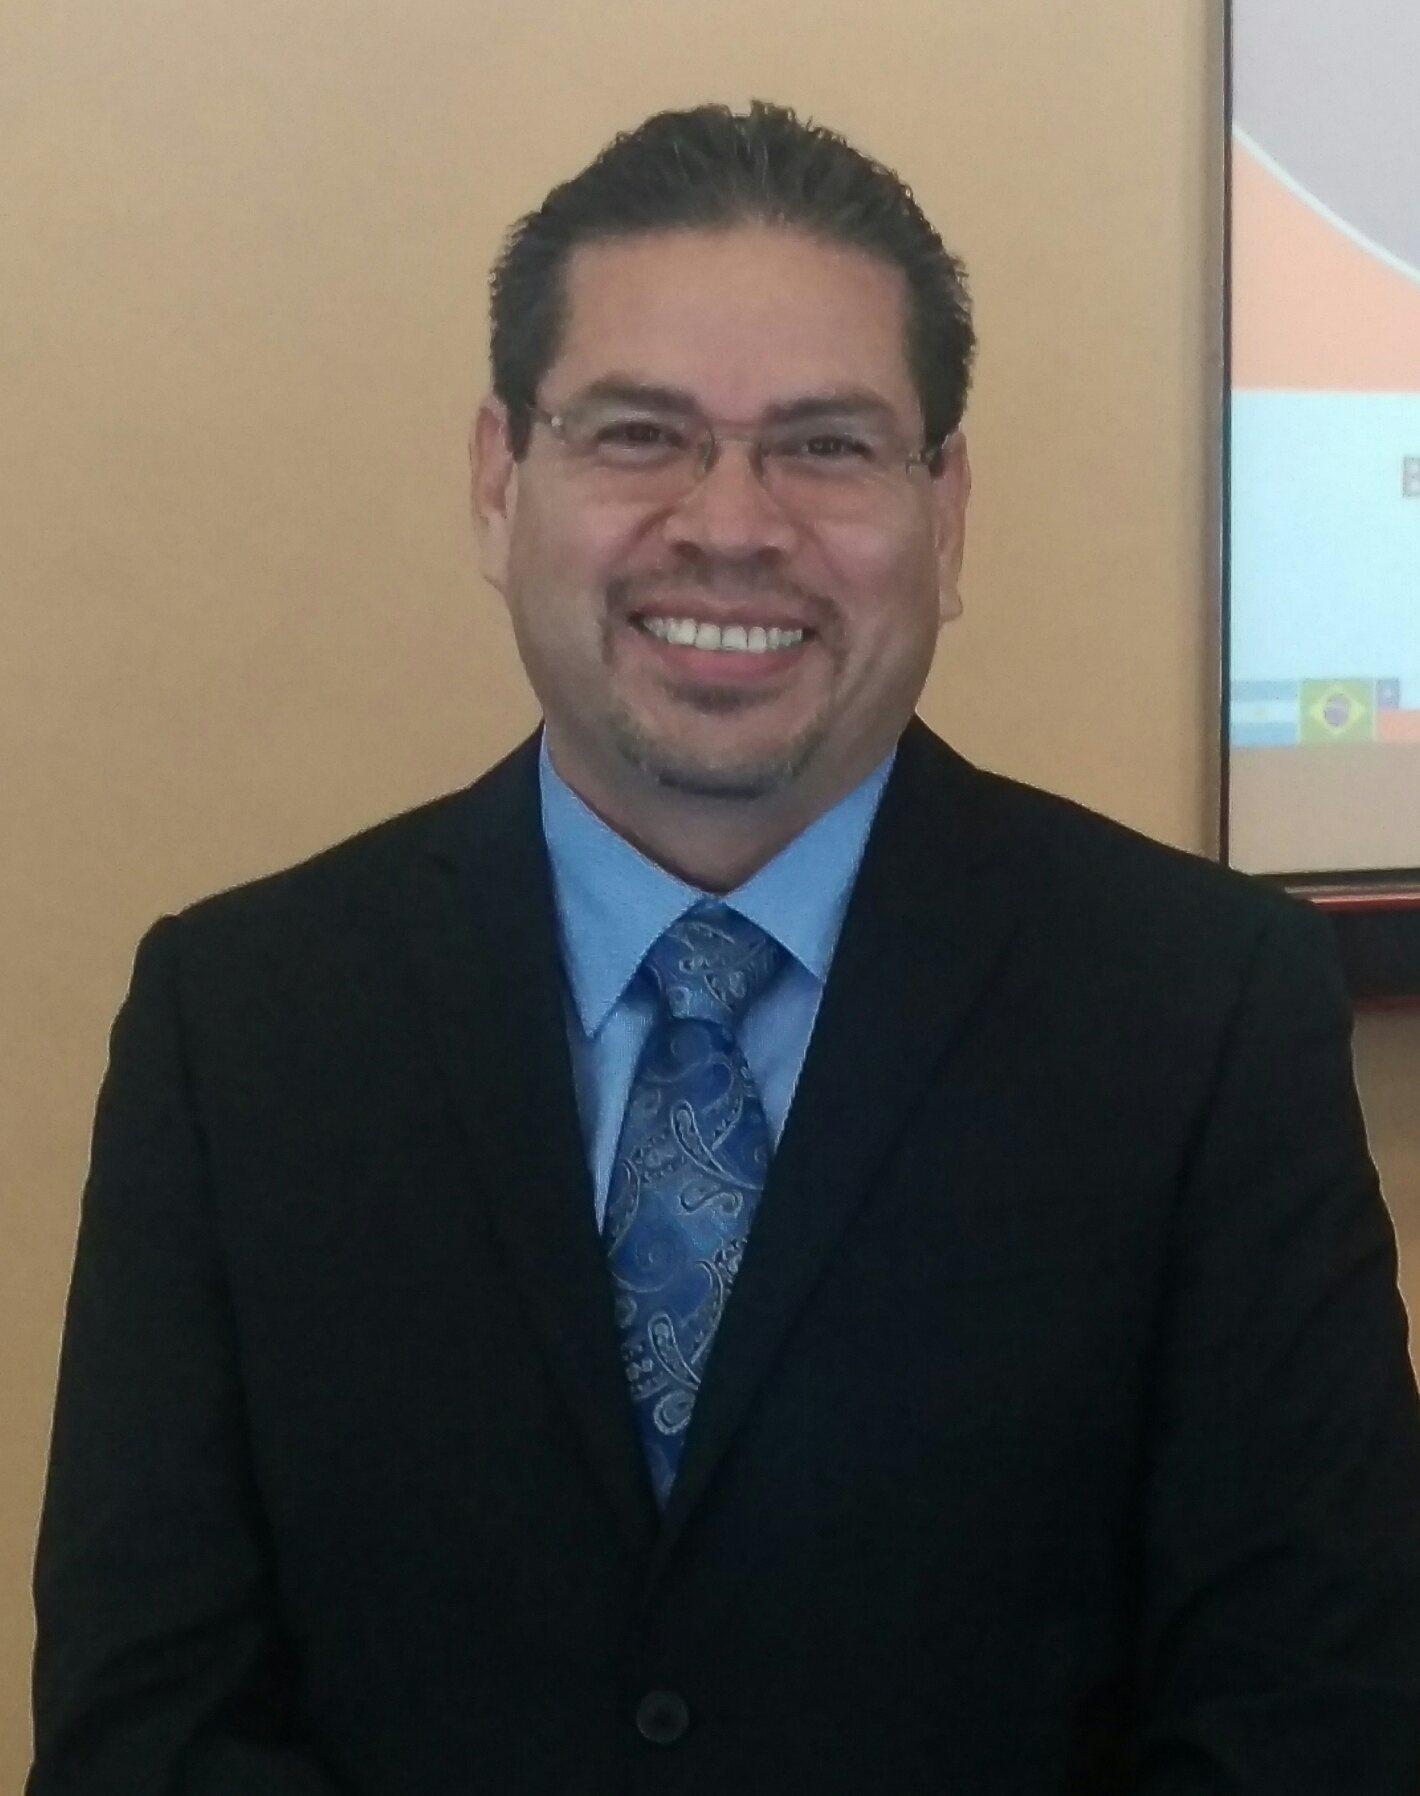 Workplace Communication Skills for Technology Alumni Raul Garcia